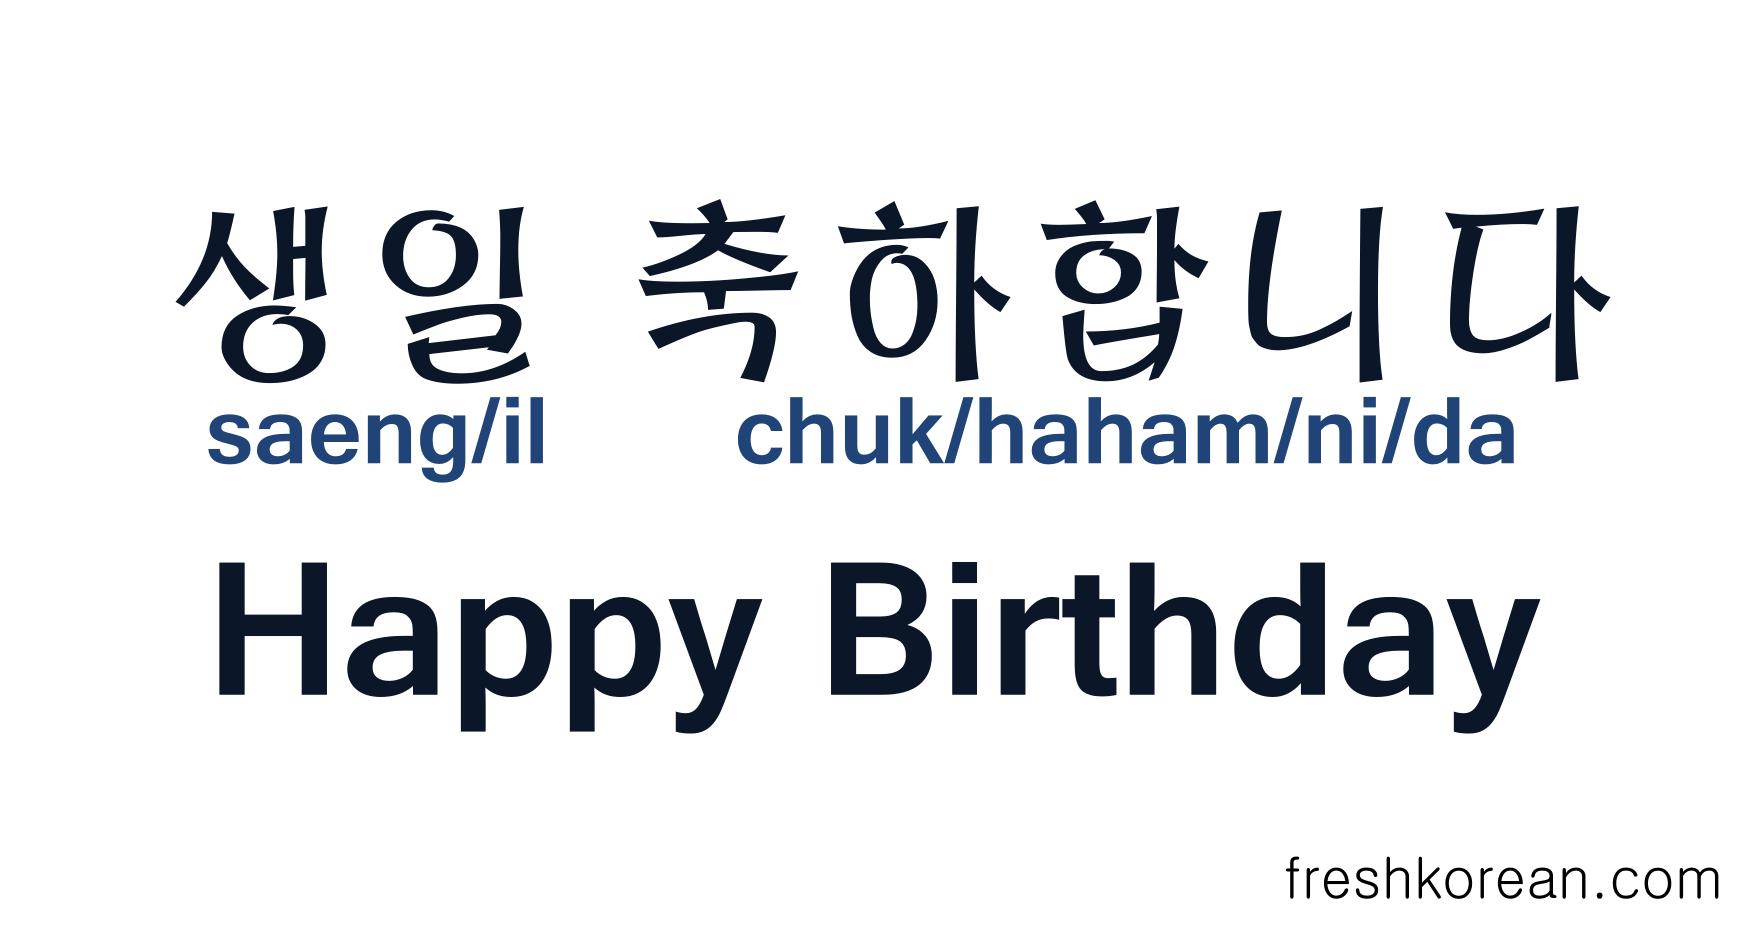 Happy Birthday in Korean - Fresh Korean 2